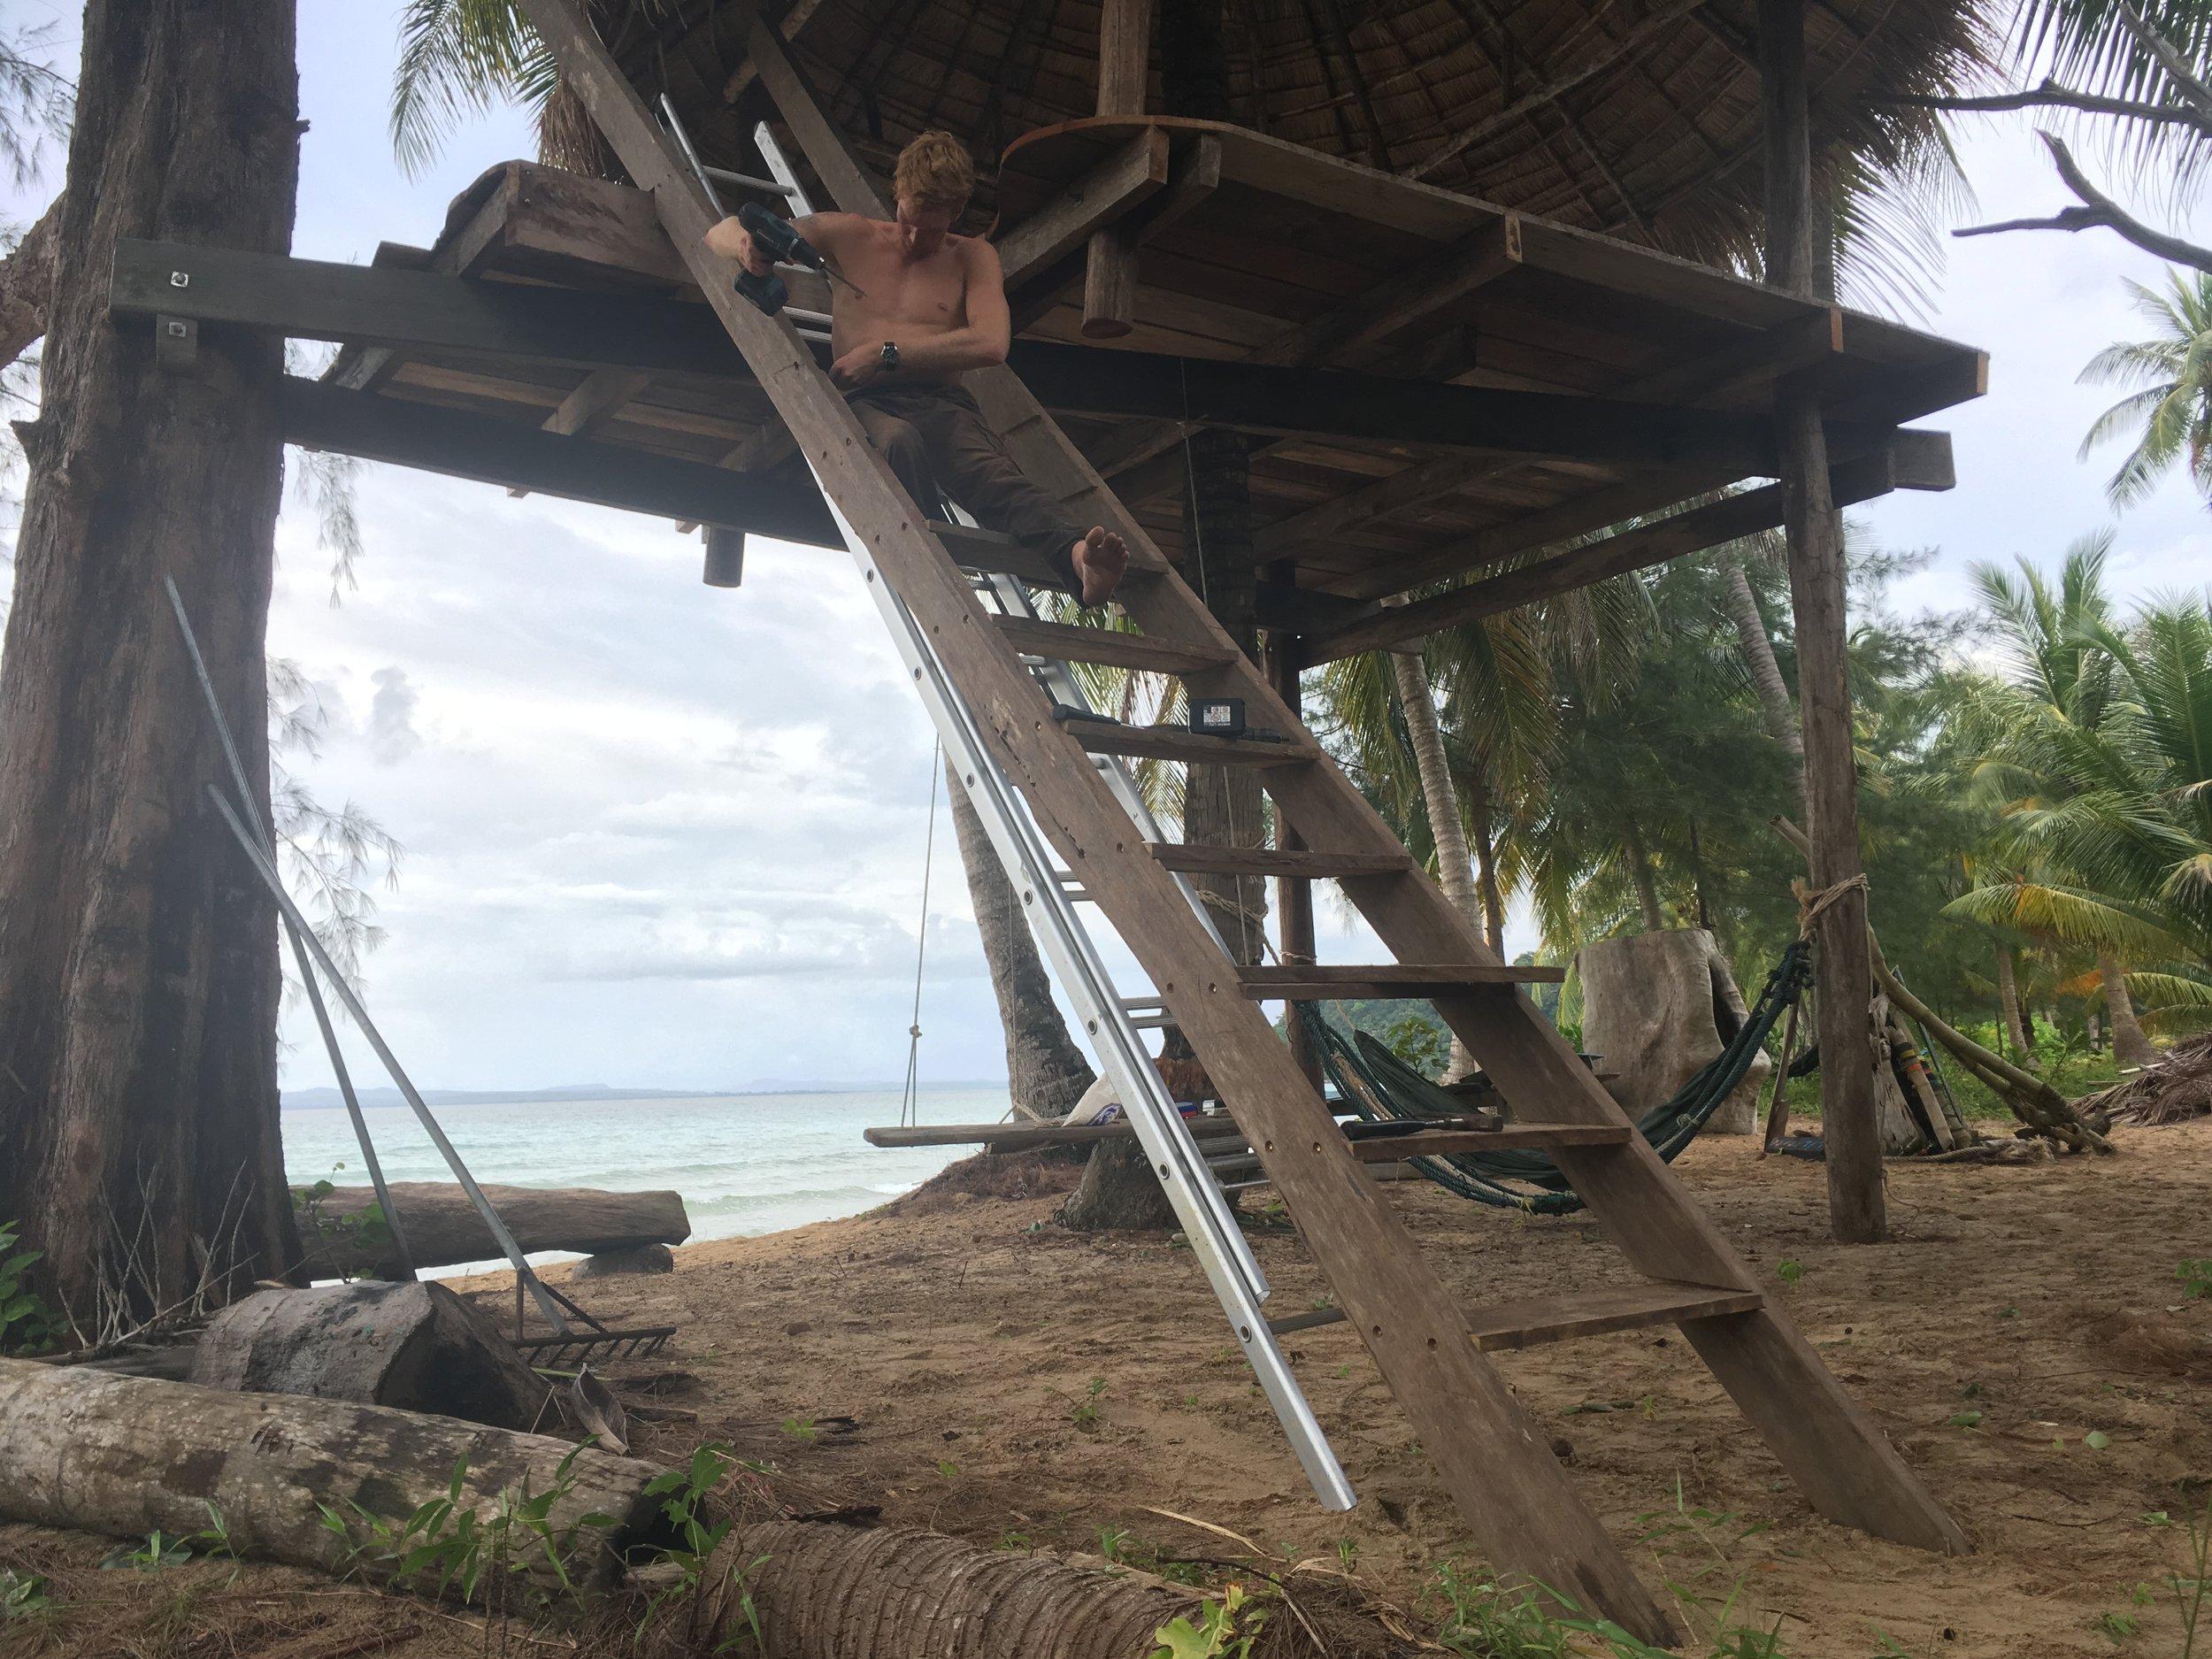 09 Cambodia Lonely beach.JPG